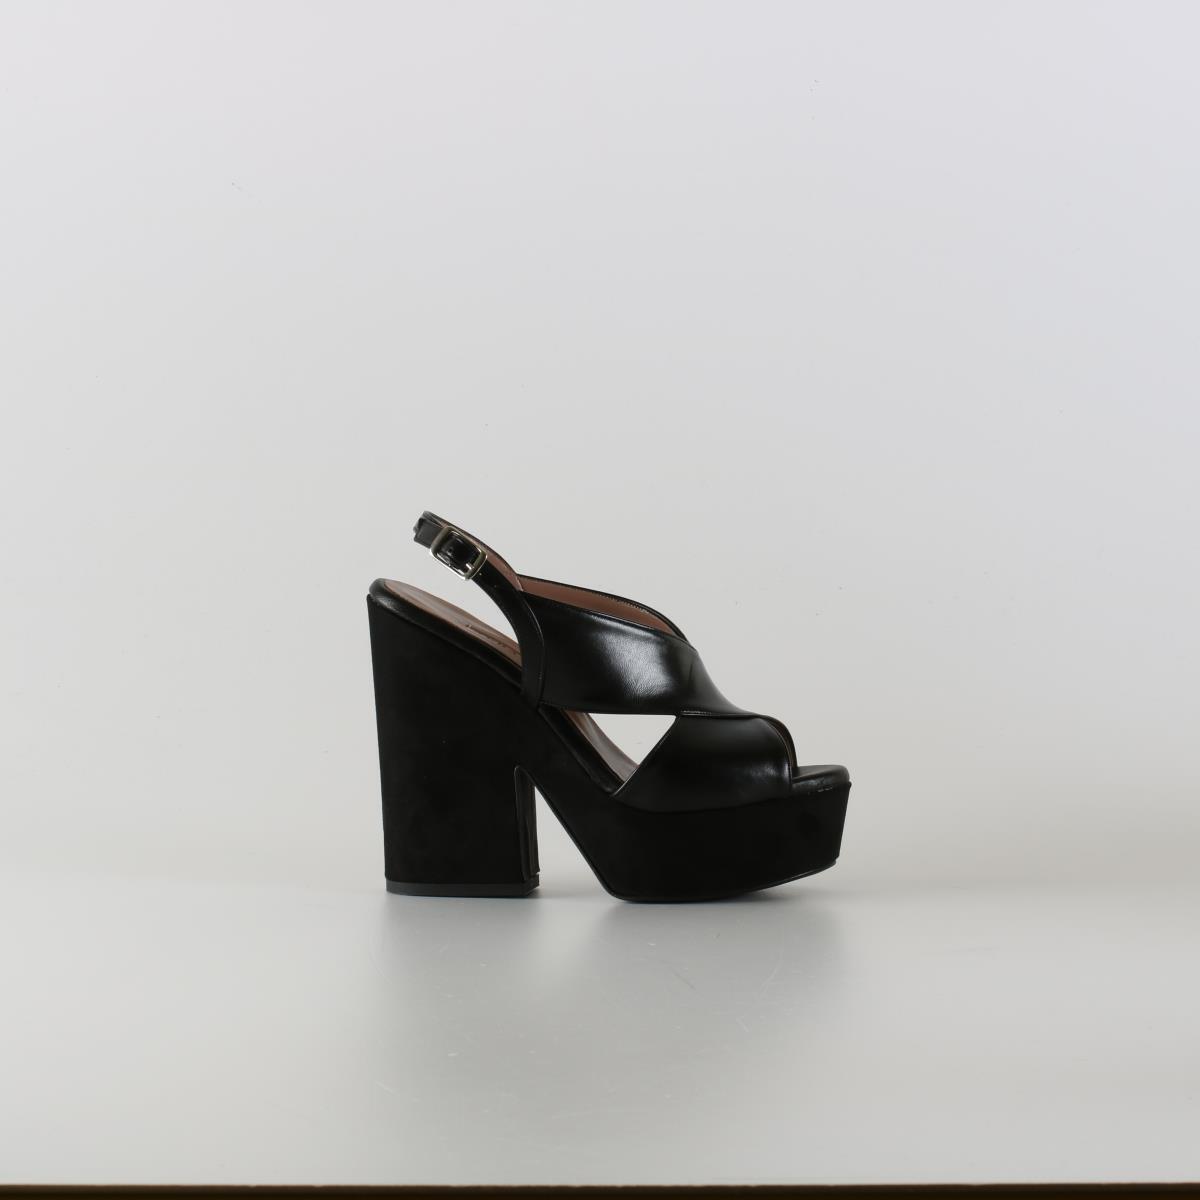 DOLCEAMARO ballerina 100% donna nero con cinturino 100% ballerina pelle MADE IN ITALY d8201f